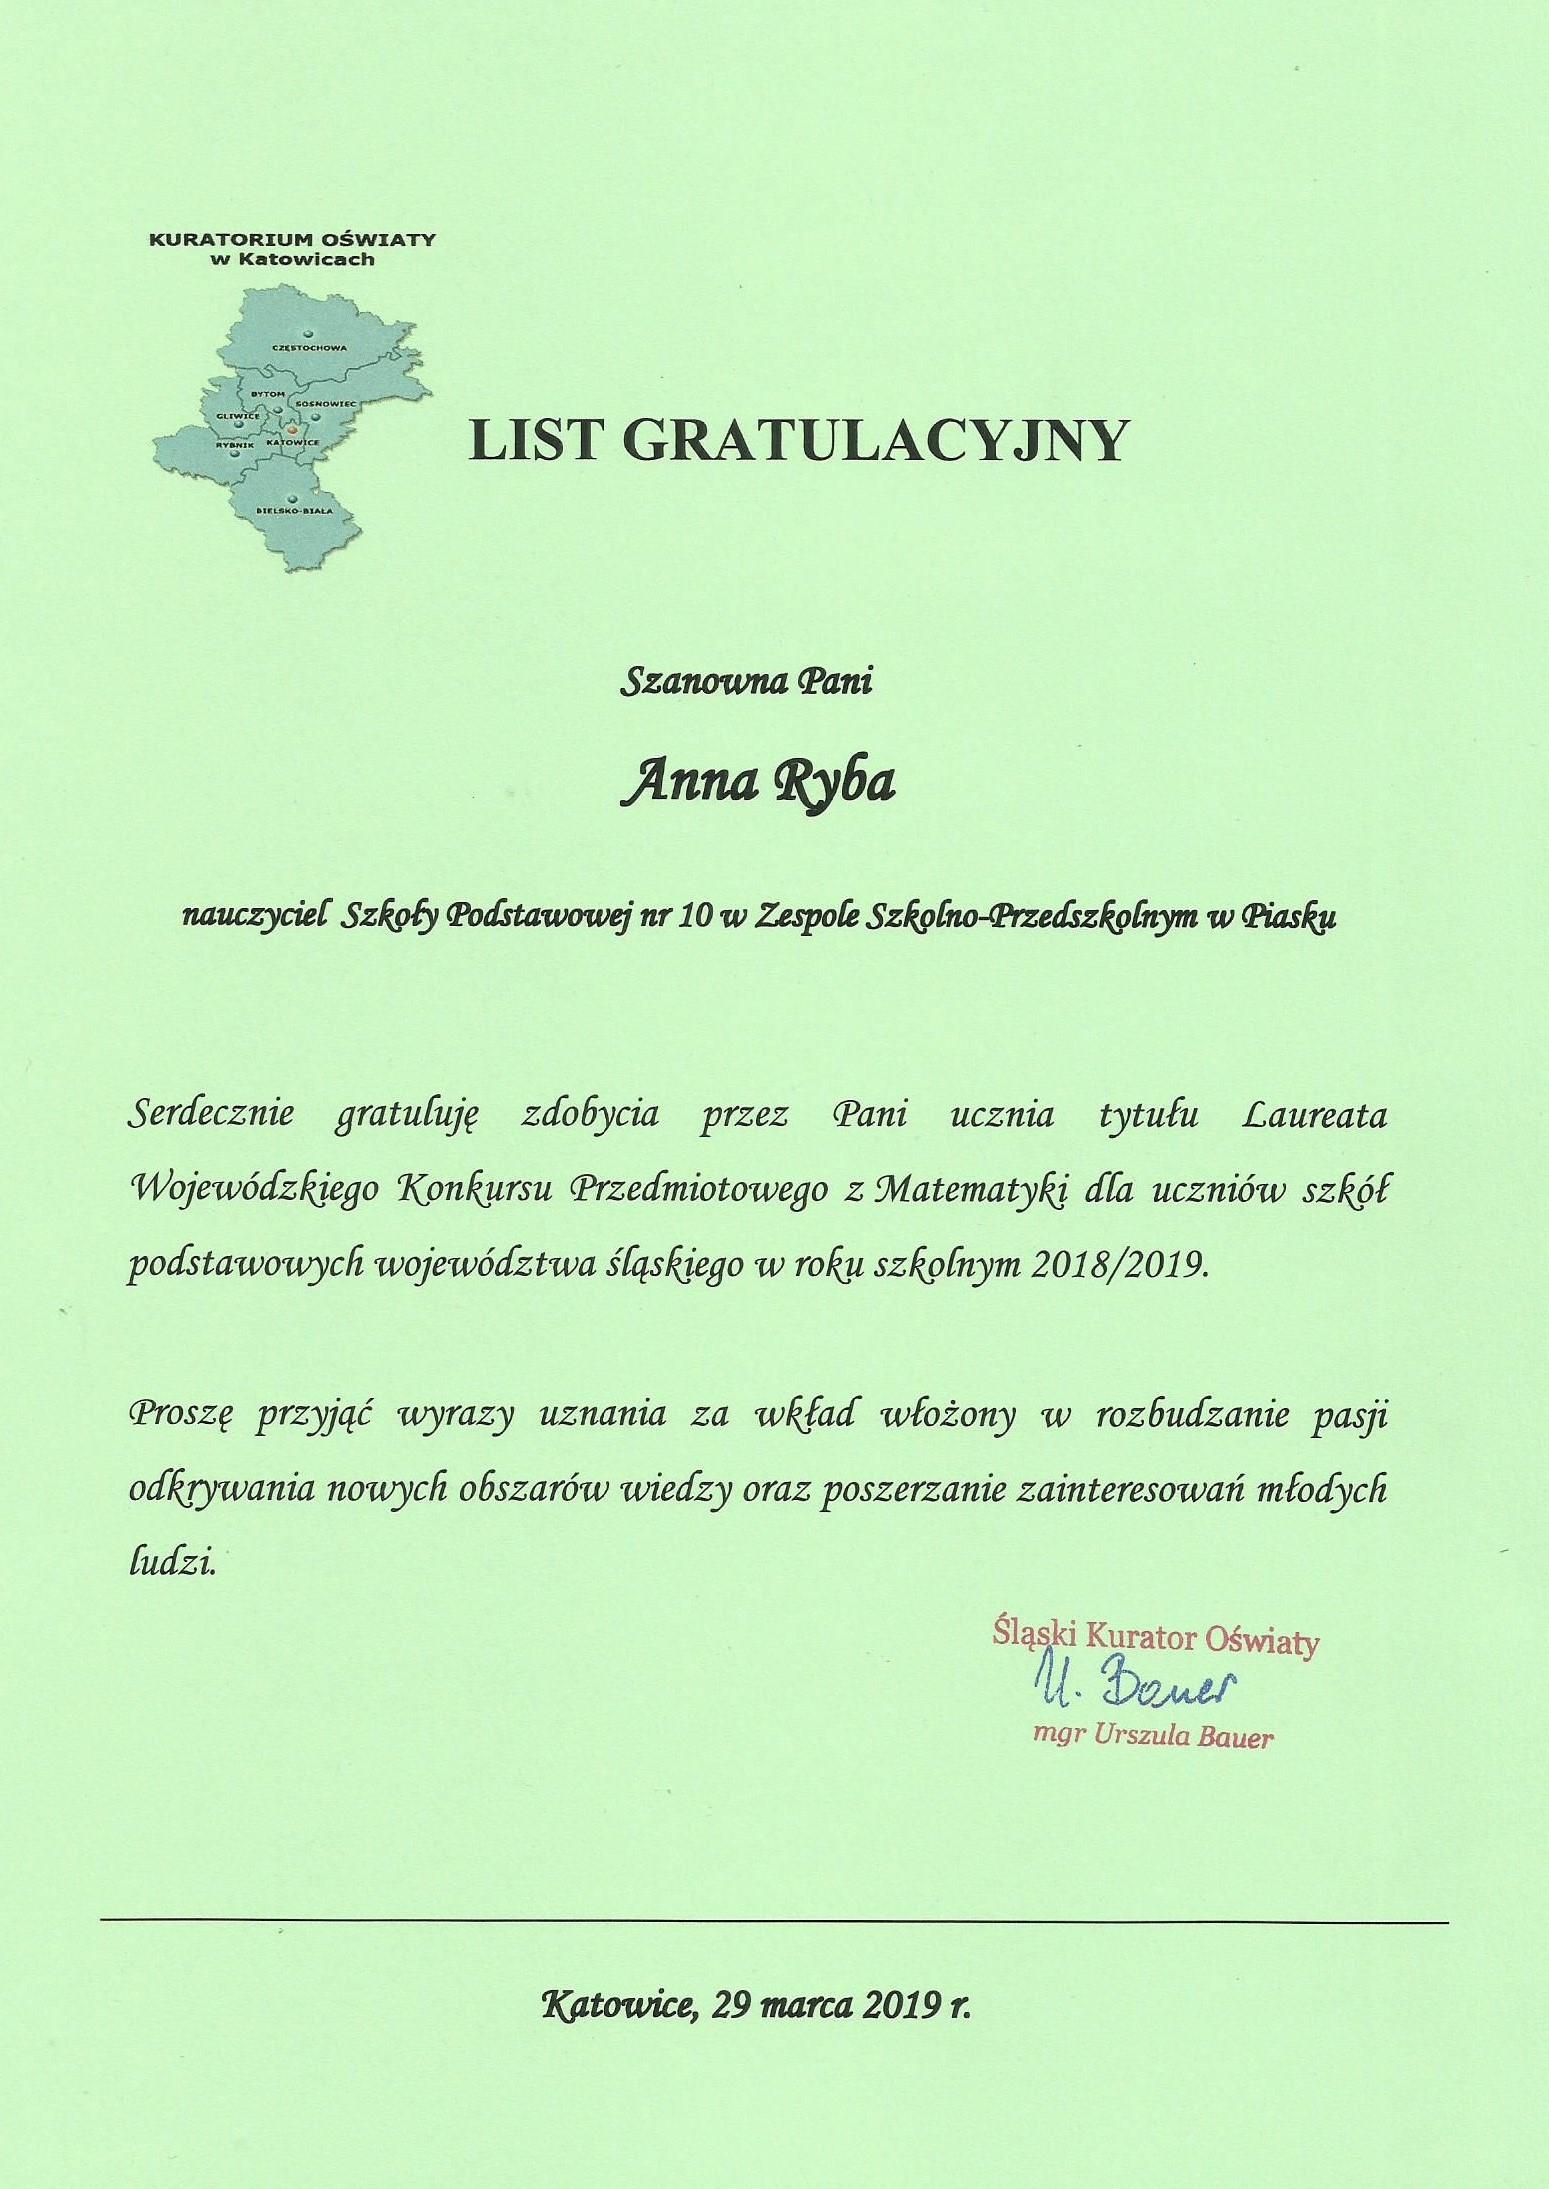 List gratulacyjny WKP